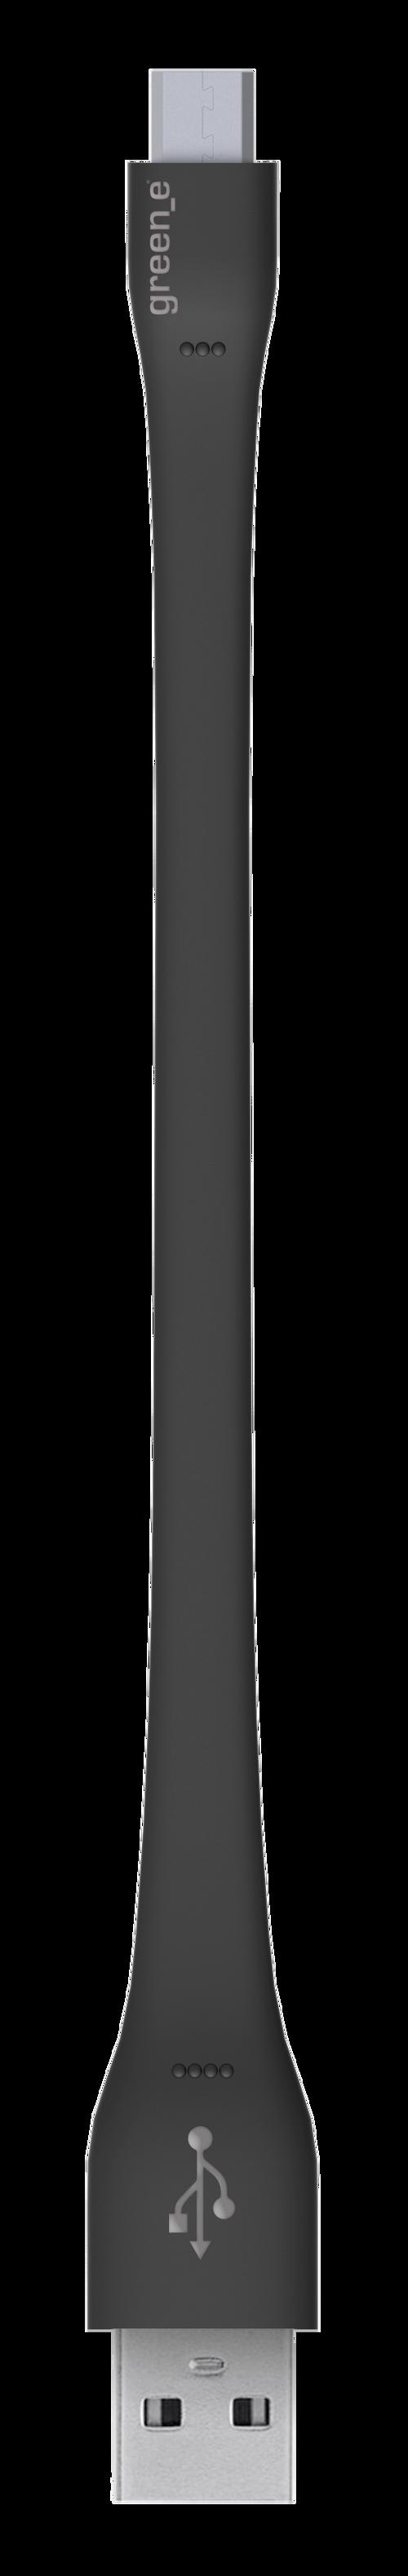 CORDON MICRO USB TPE XS 2,1A NOIR 15 CM gr1004-1